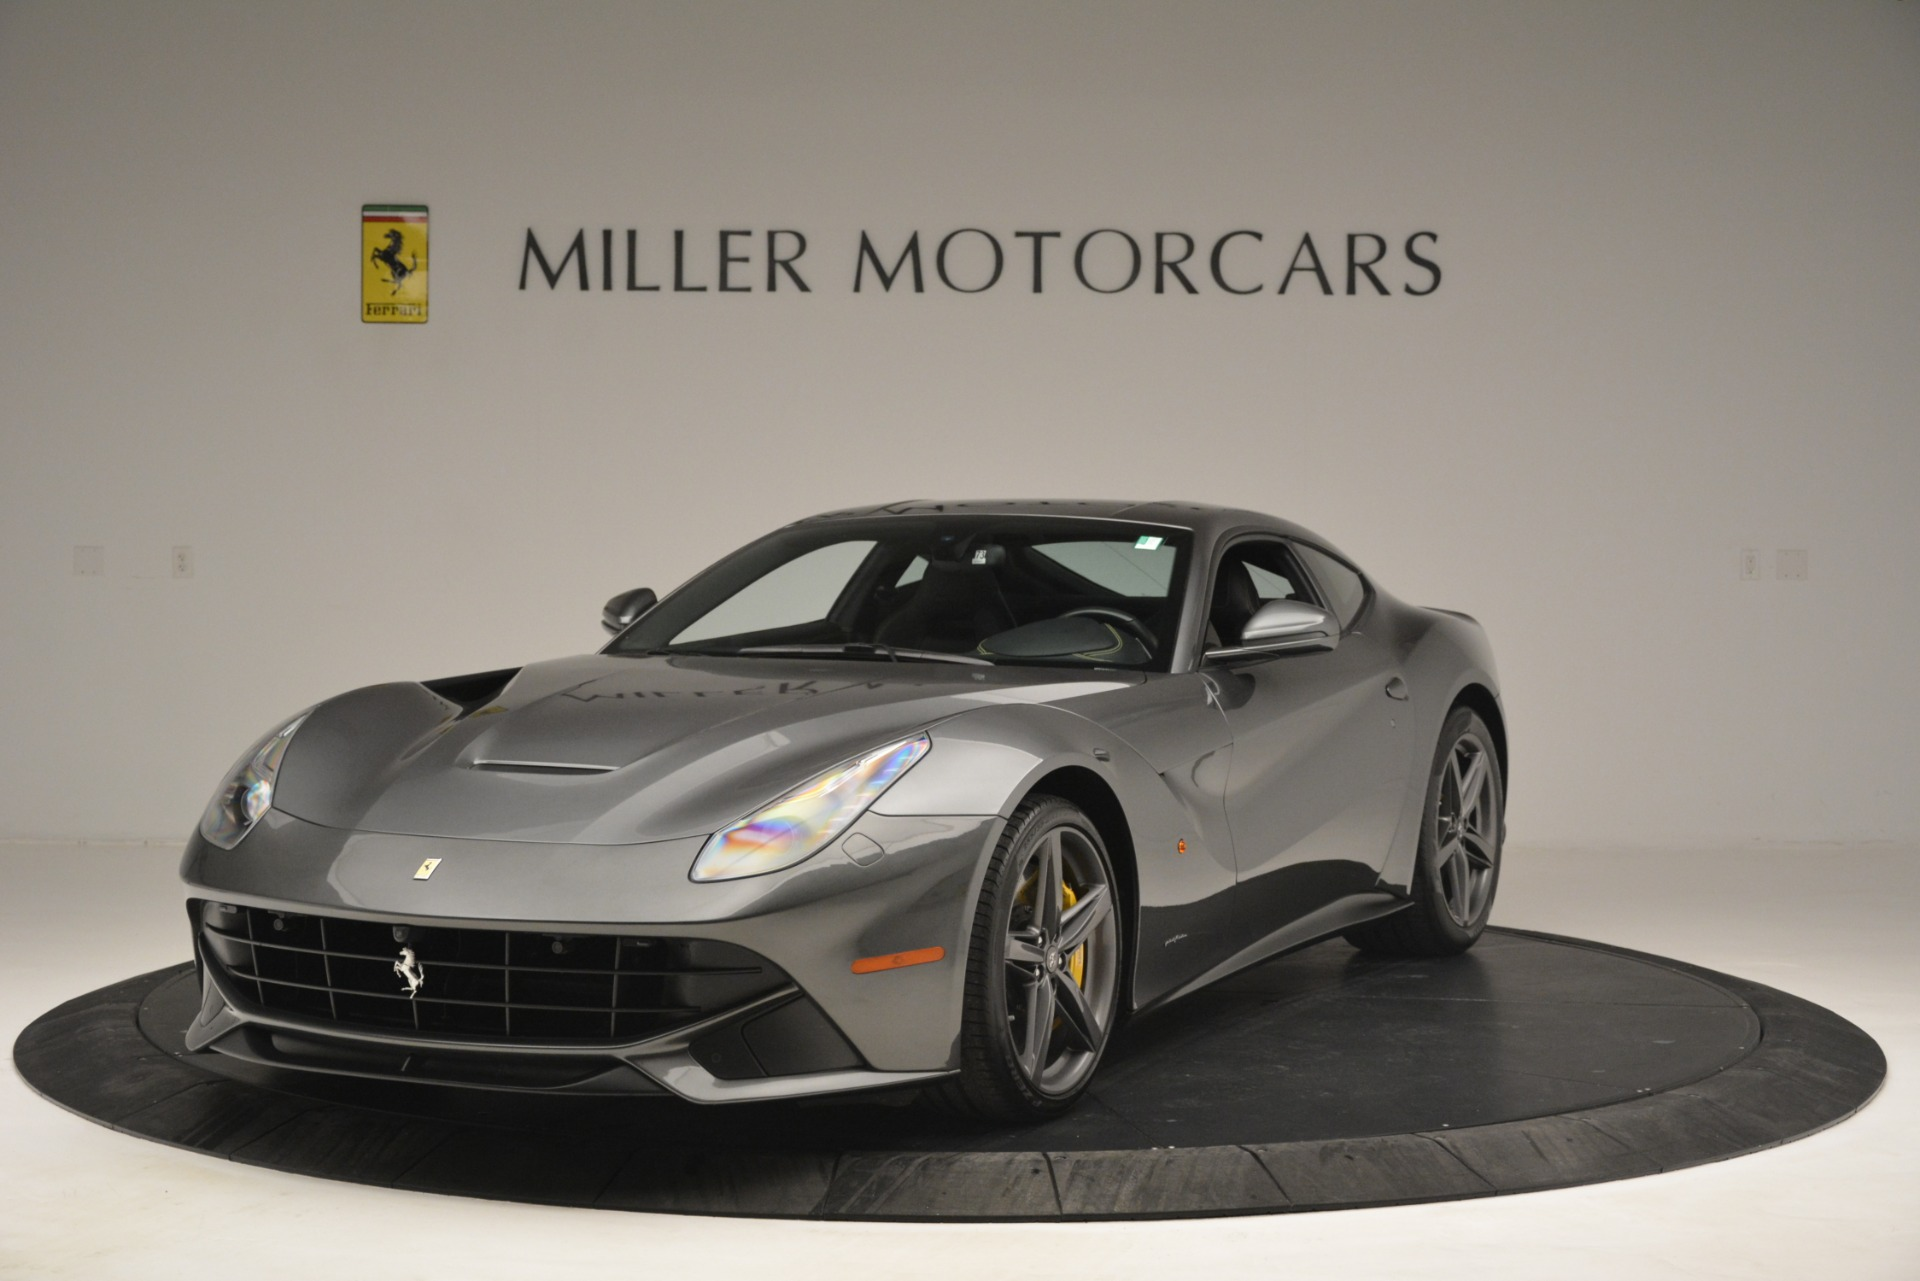 Used 2016 Ferrari F12 Berlinetta for sale Sold at Maserati of Greenwich in Greenwich CT 06830 1